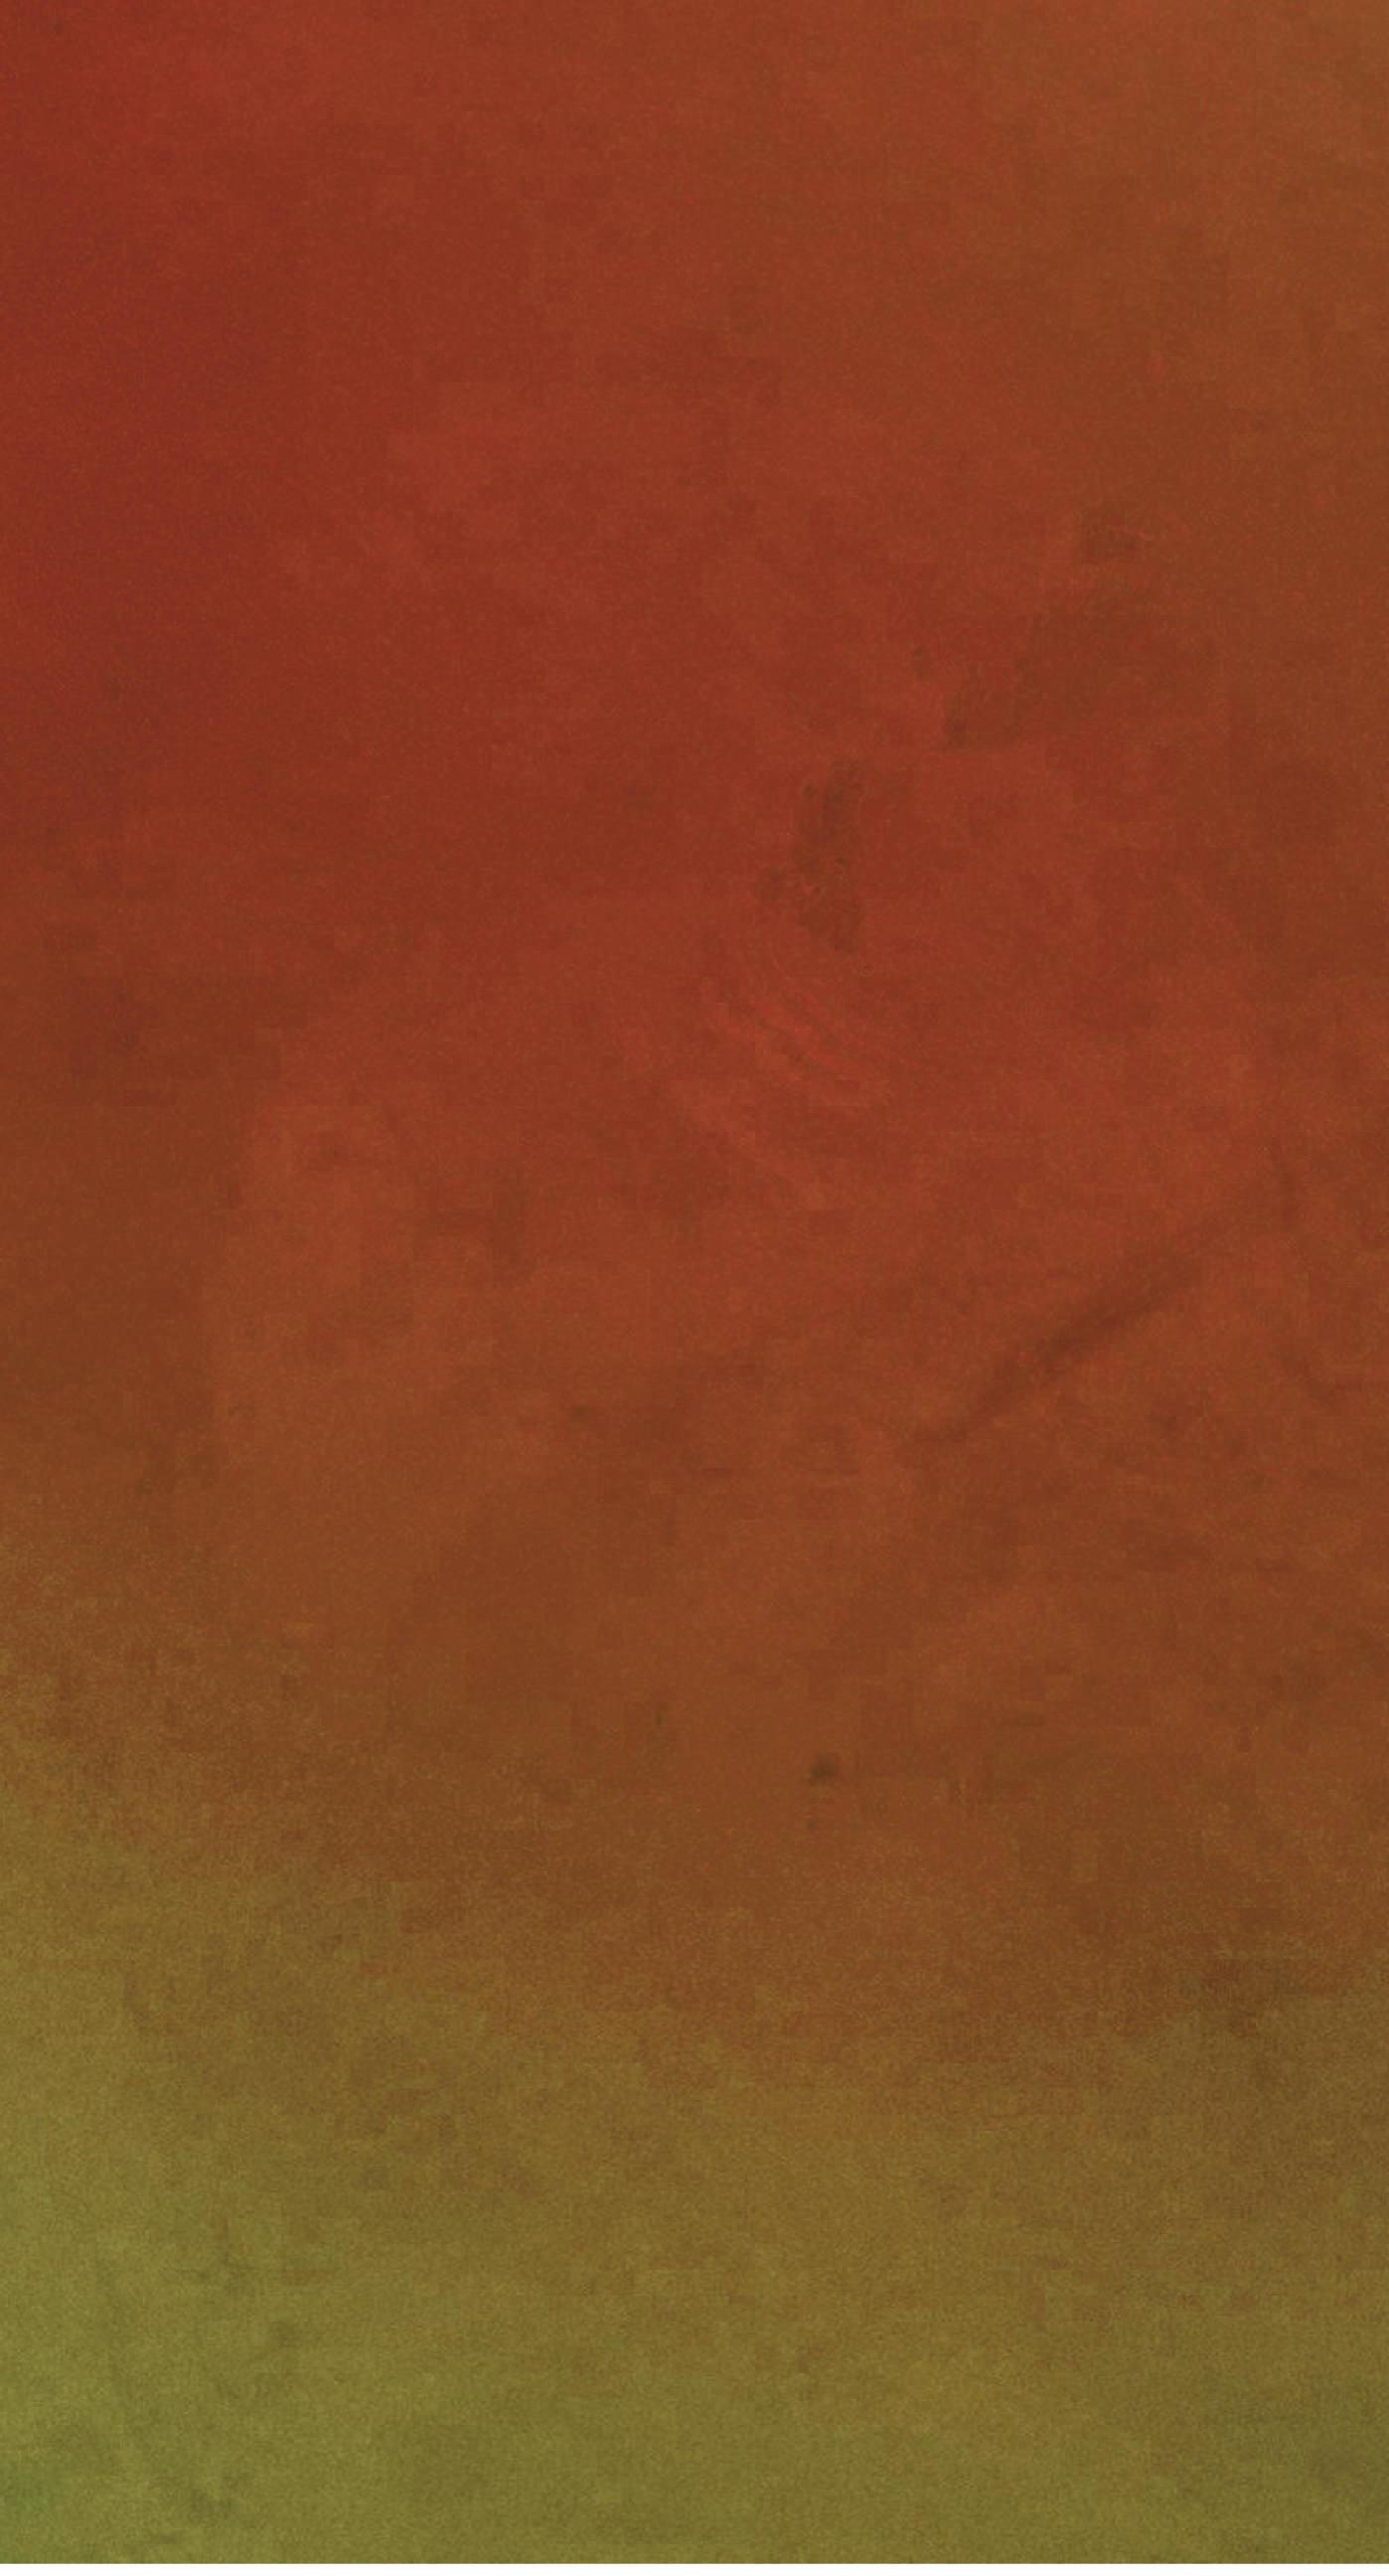 Brownredyellow. iPhone 6s Plus / iPhone 6 Plus wallpaper